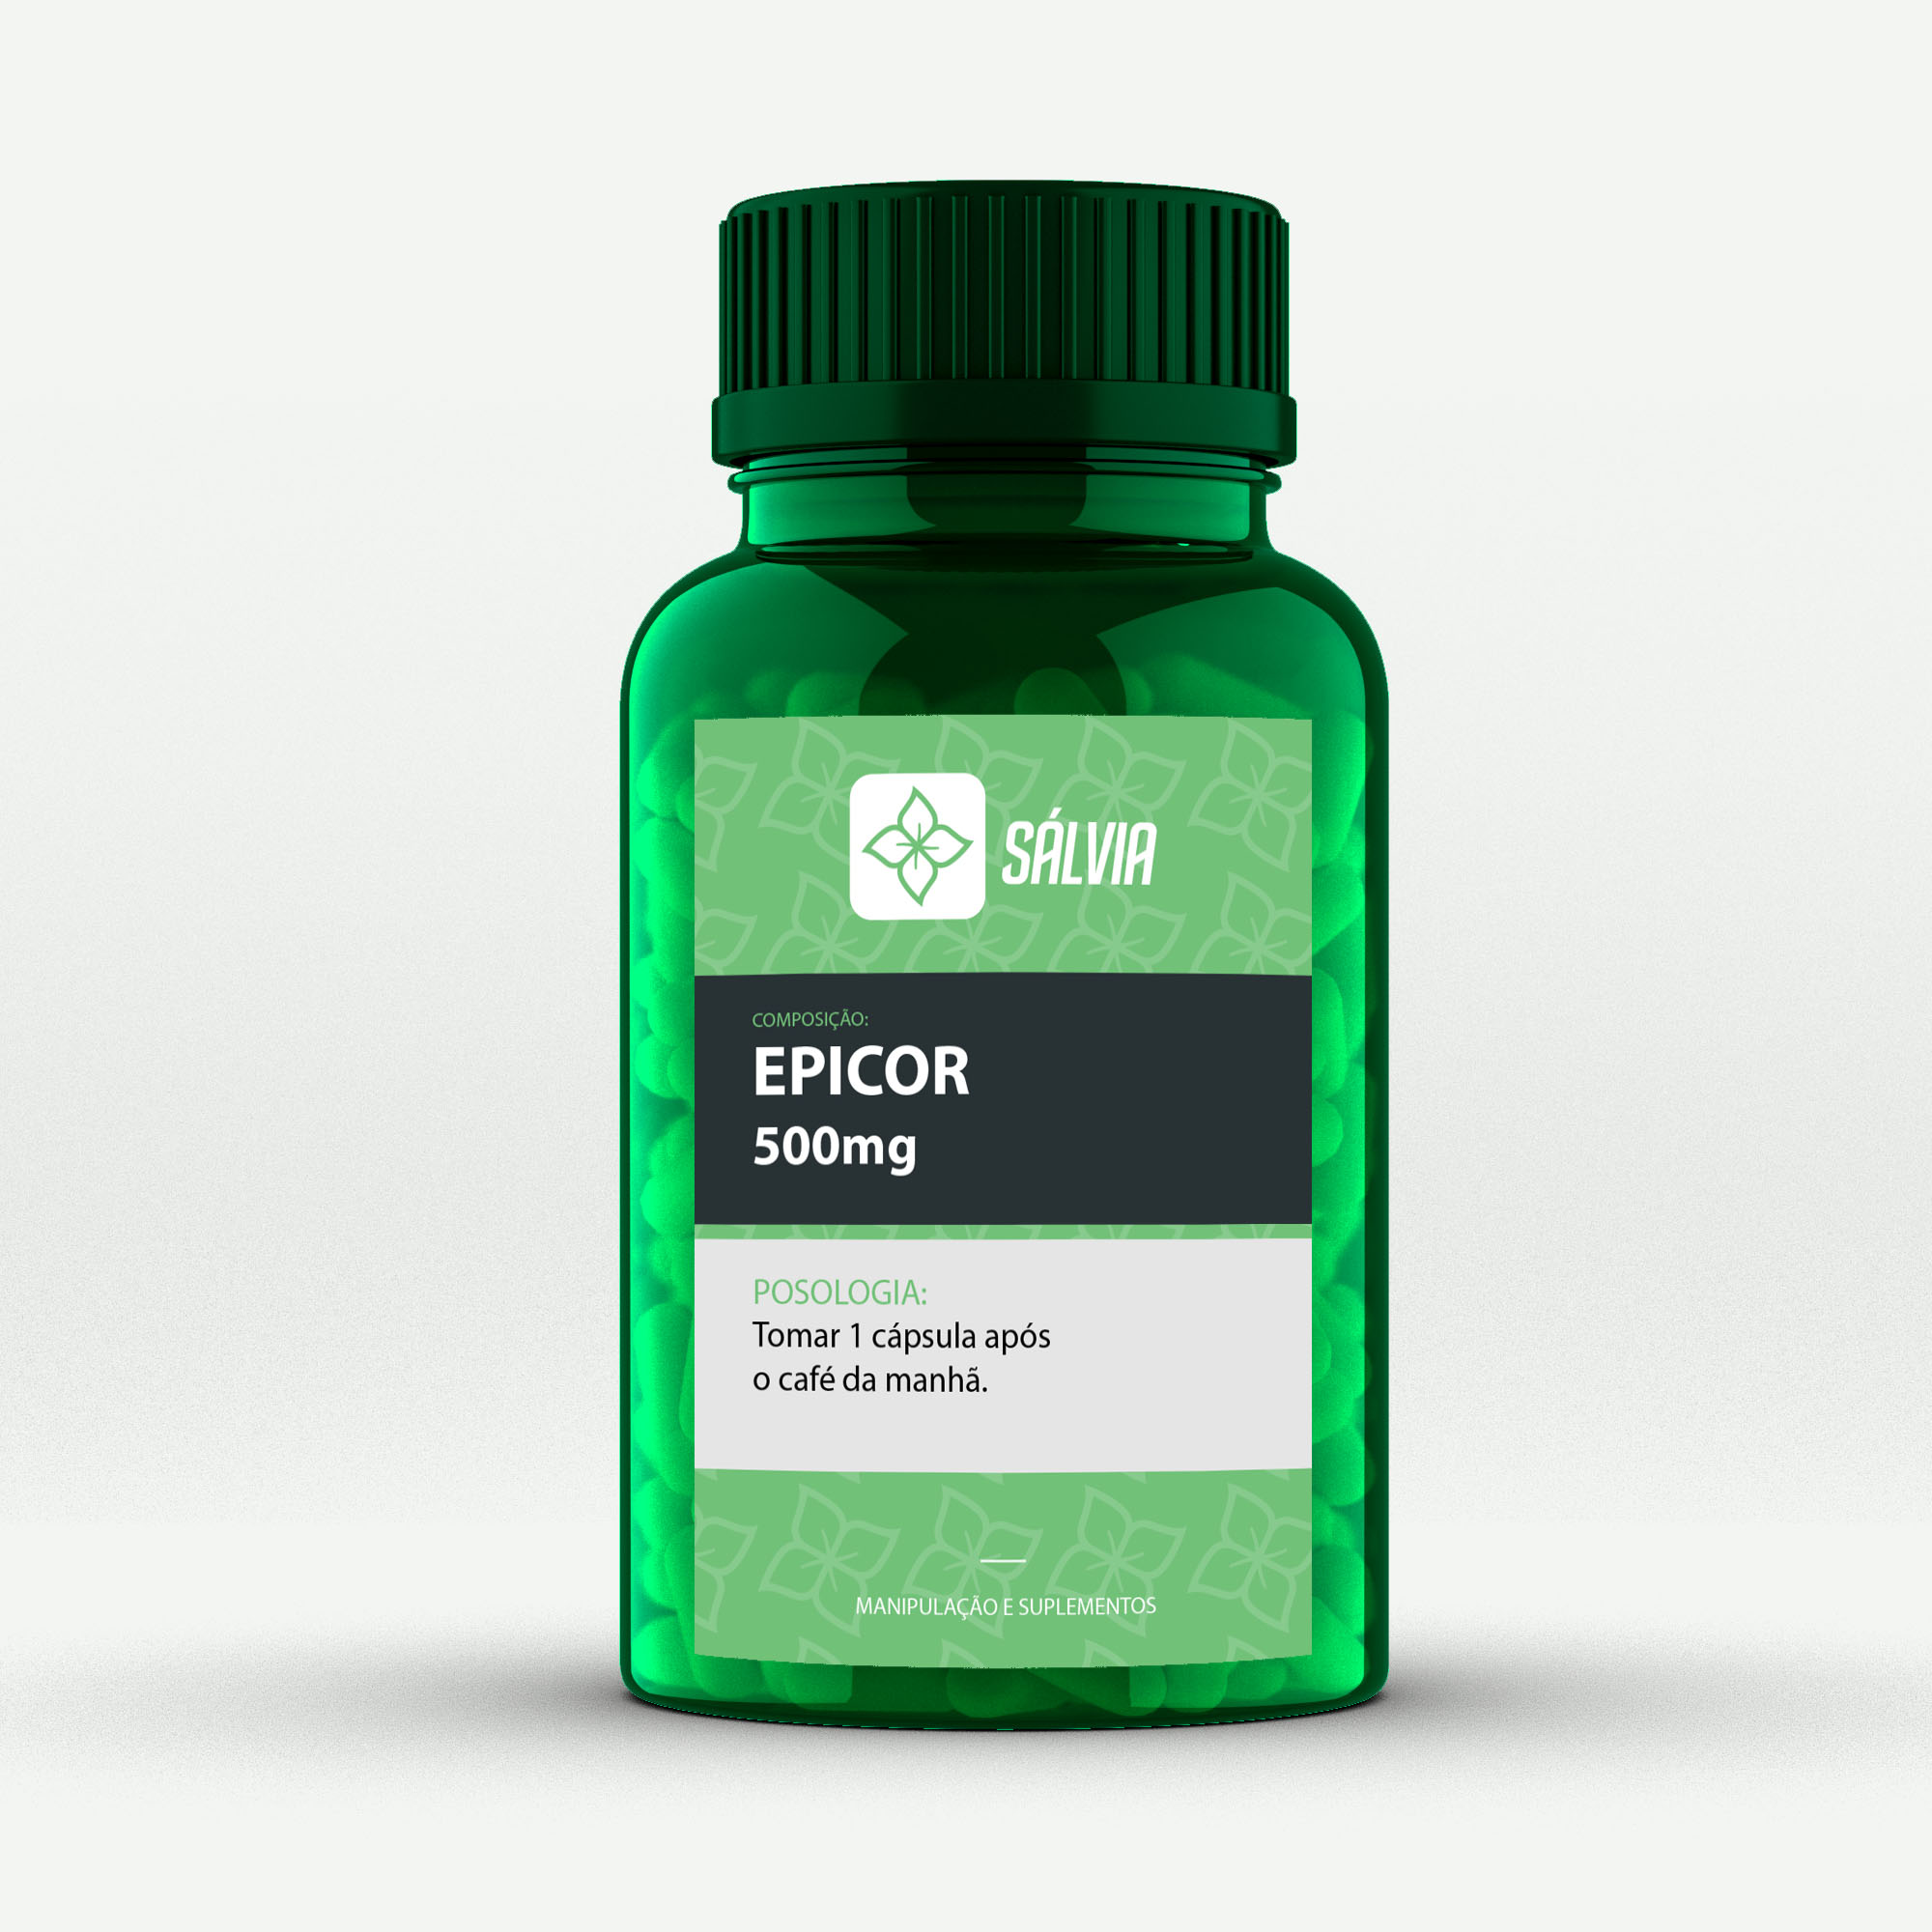 EPICOR 500mg - Cápsulas